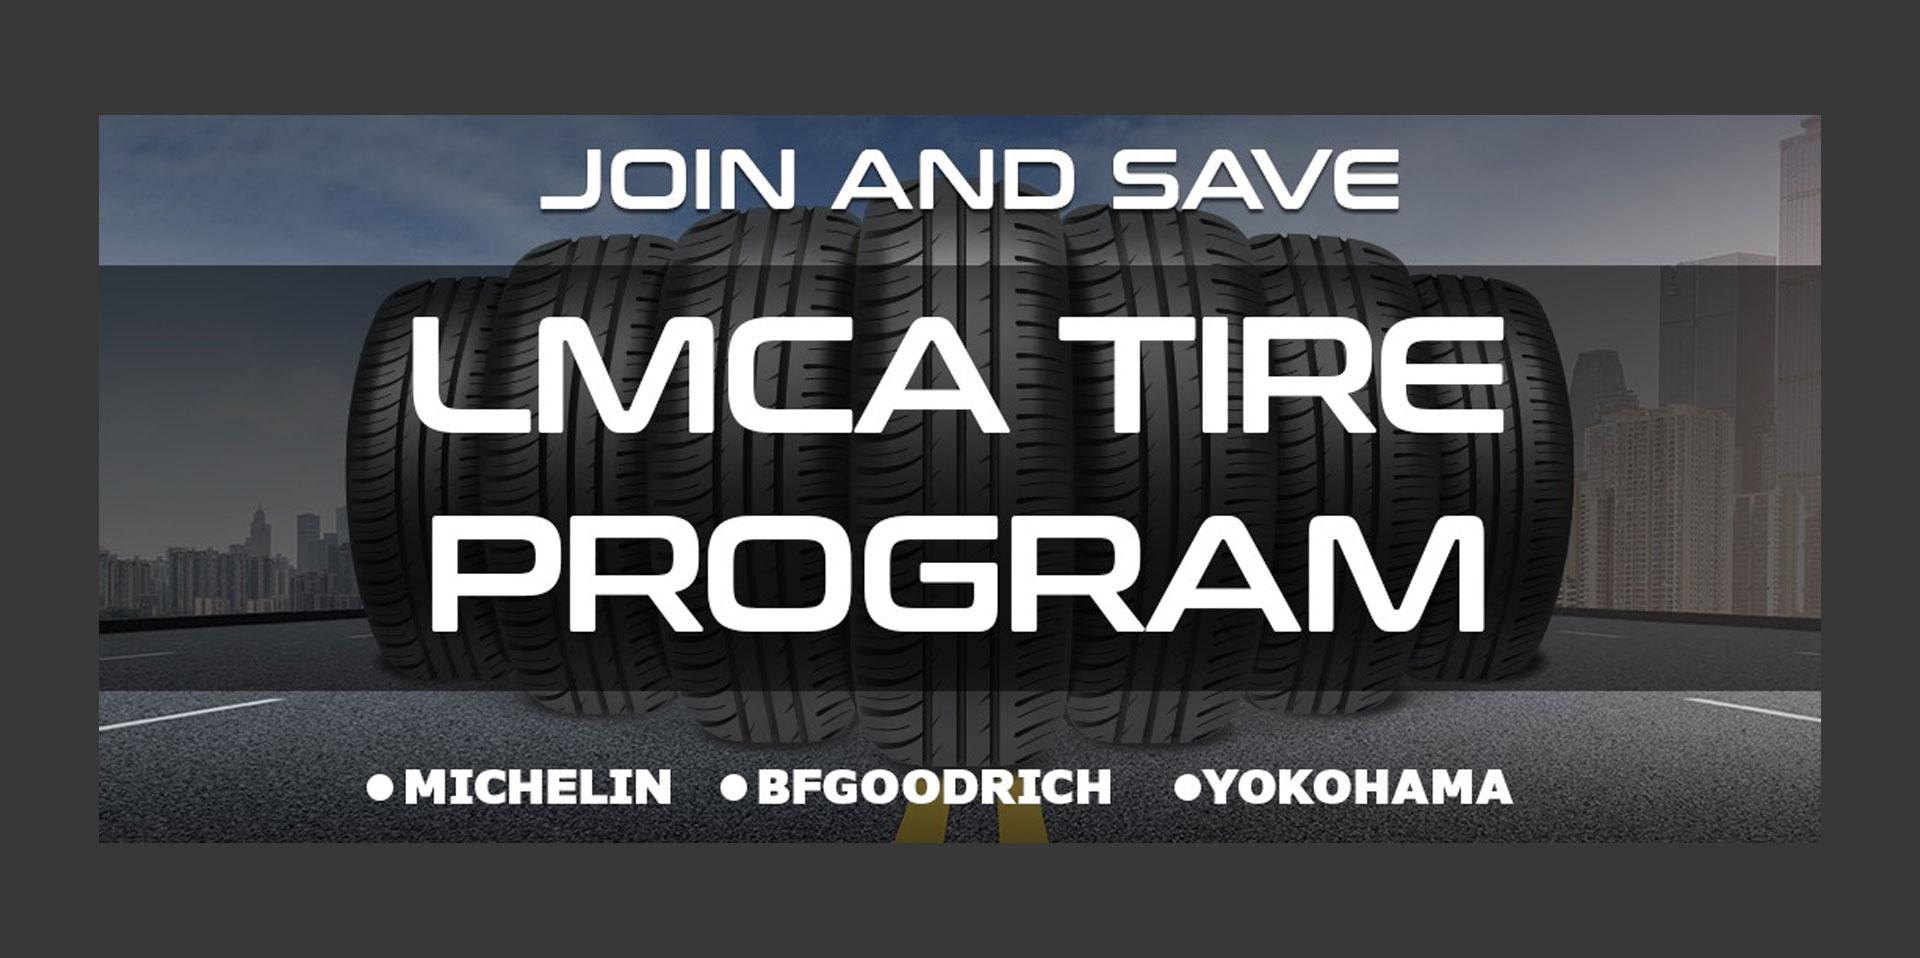 JOIN THE LMCA/TXTA TIRE PROGRAM AND SAVE!